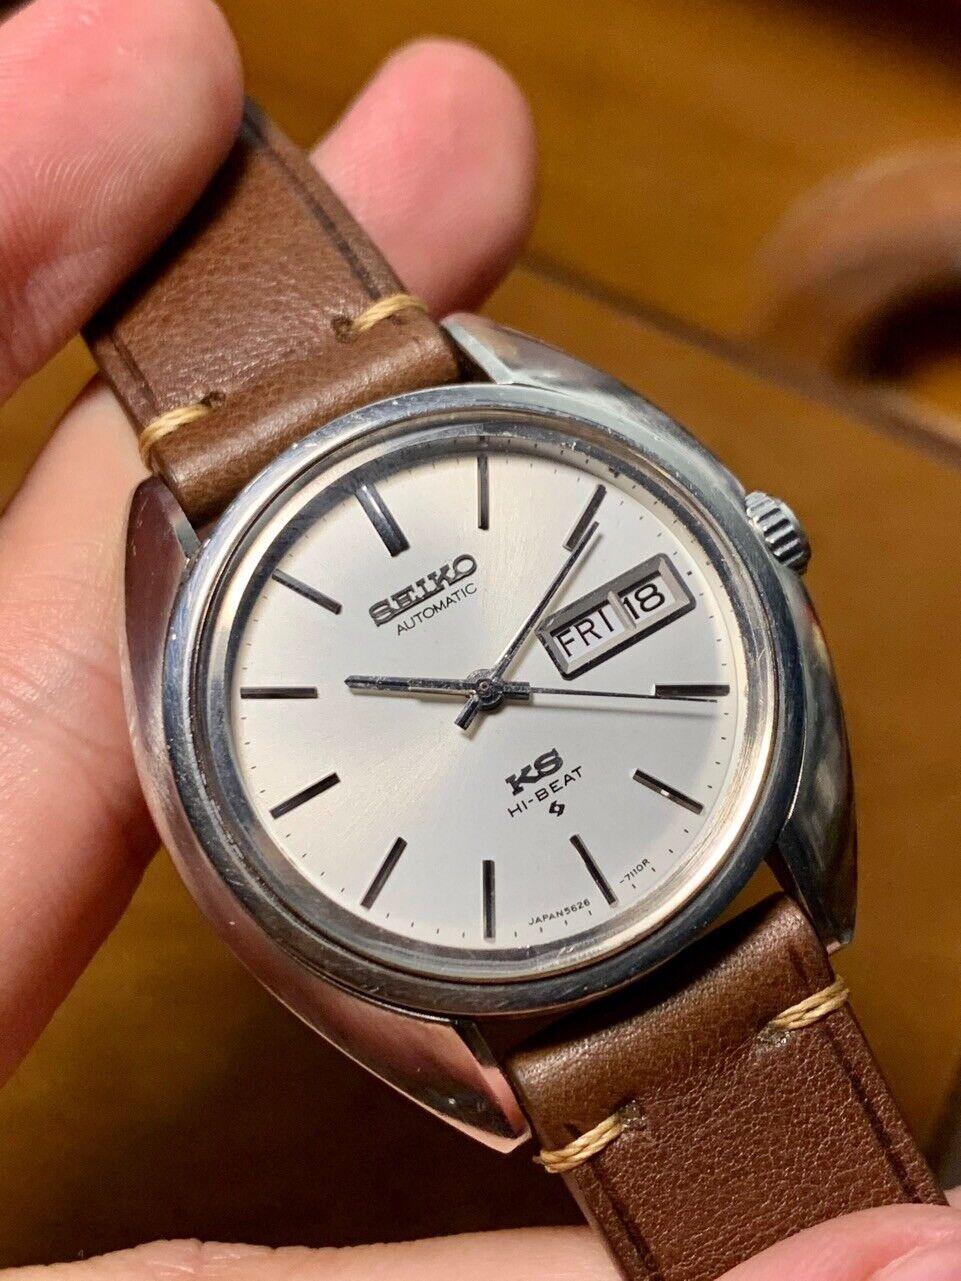 Image 1 - Vintage 1970s KING SEIKO 5626 SS Hi-Beat Automatic Men's Watch.